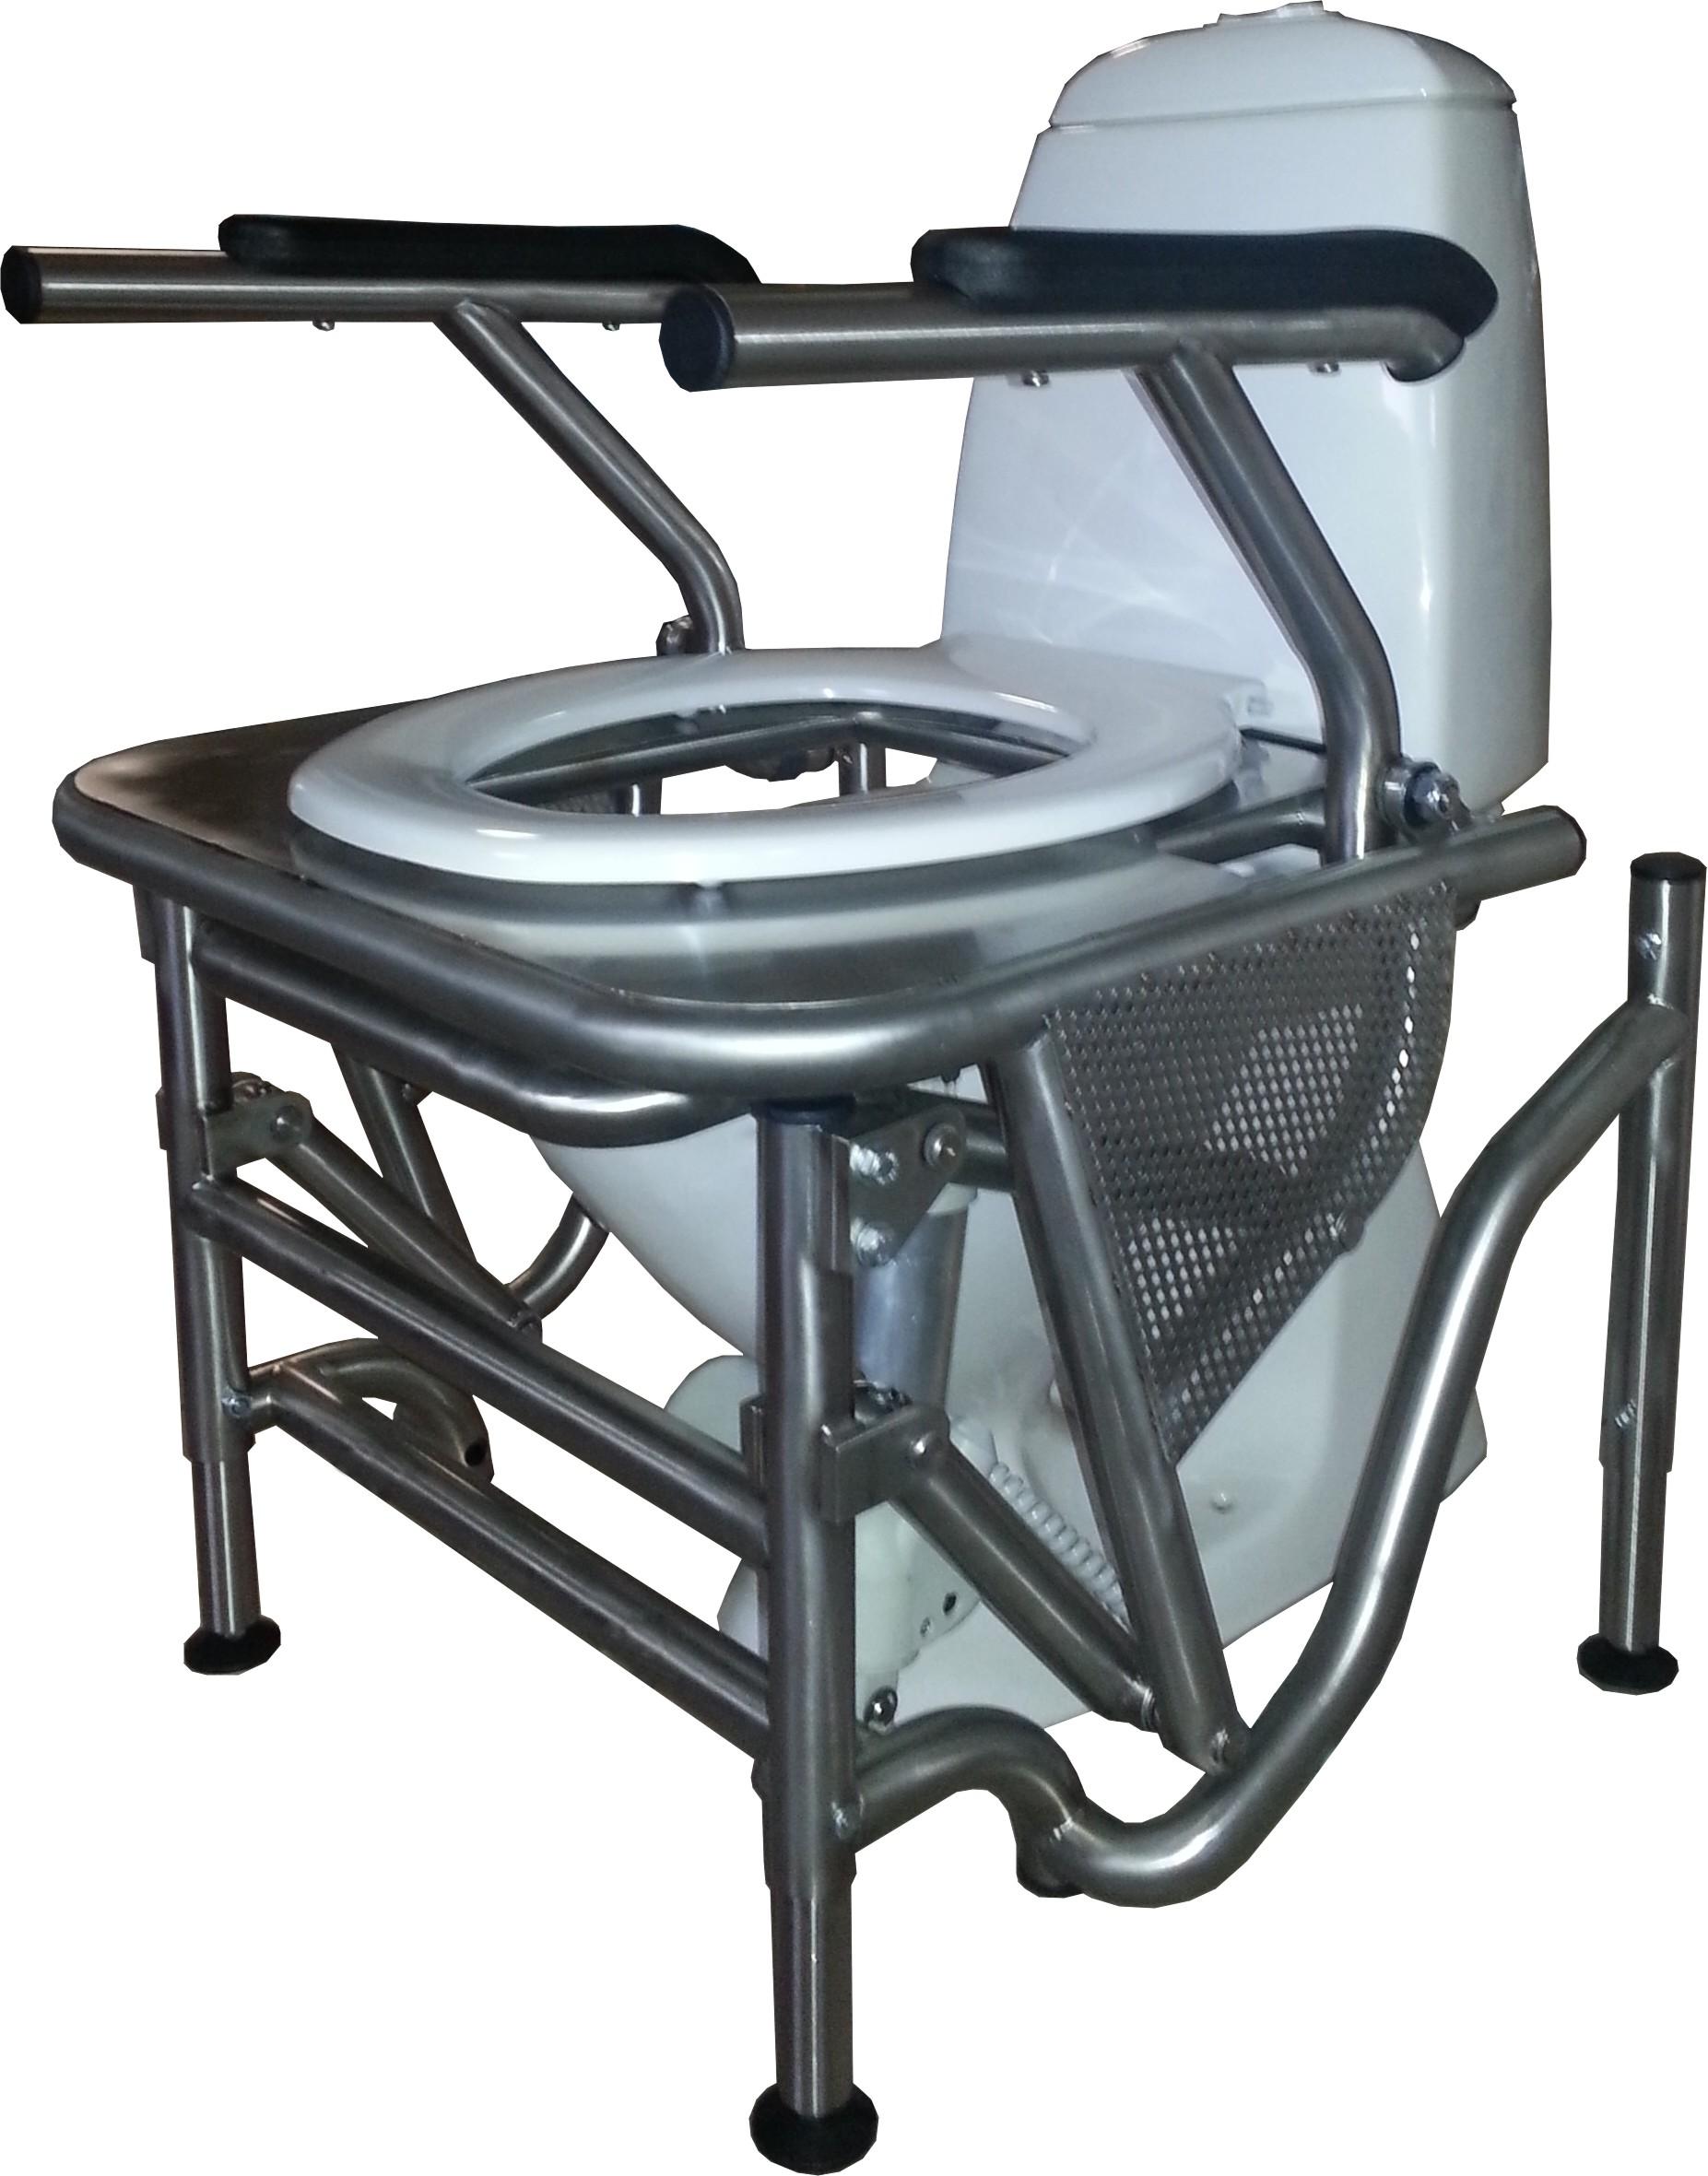 mobiler toilettenstuhl mmc attris anpassbare. Black Bedroom Furniture Sets. Home Design Ideas